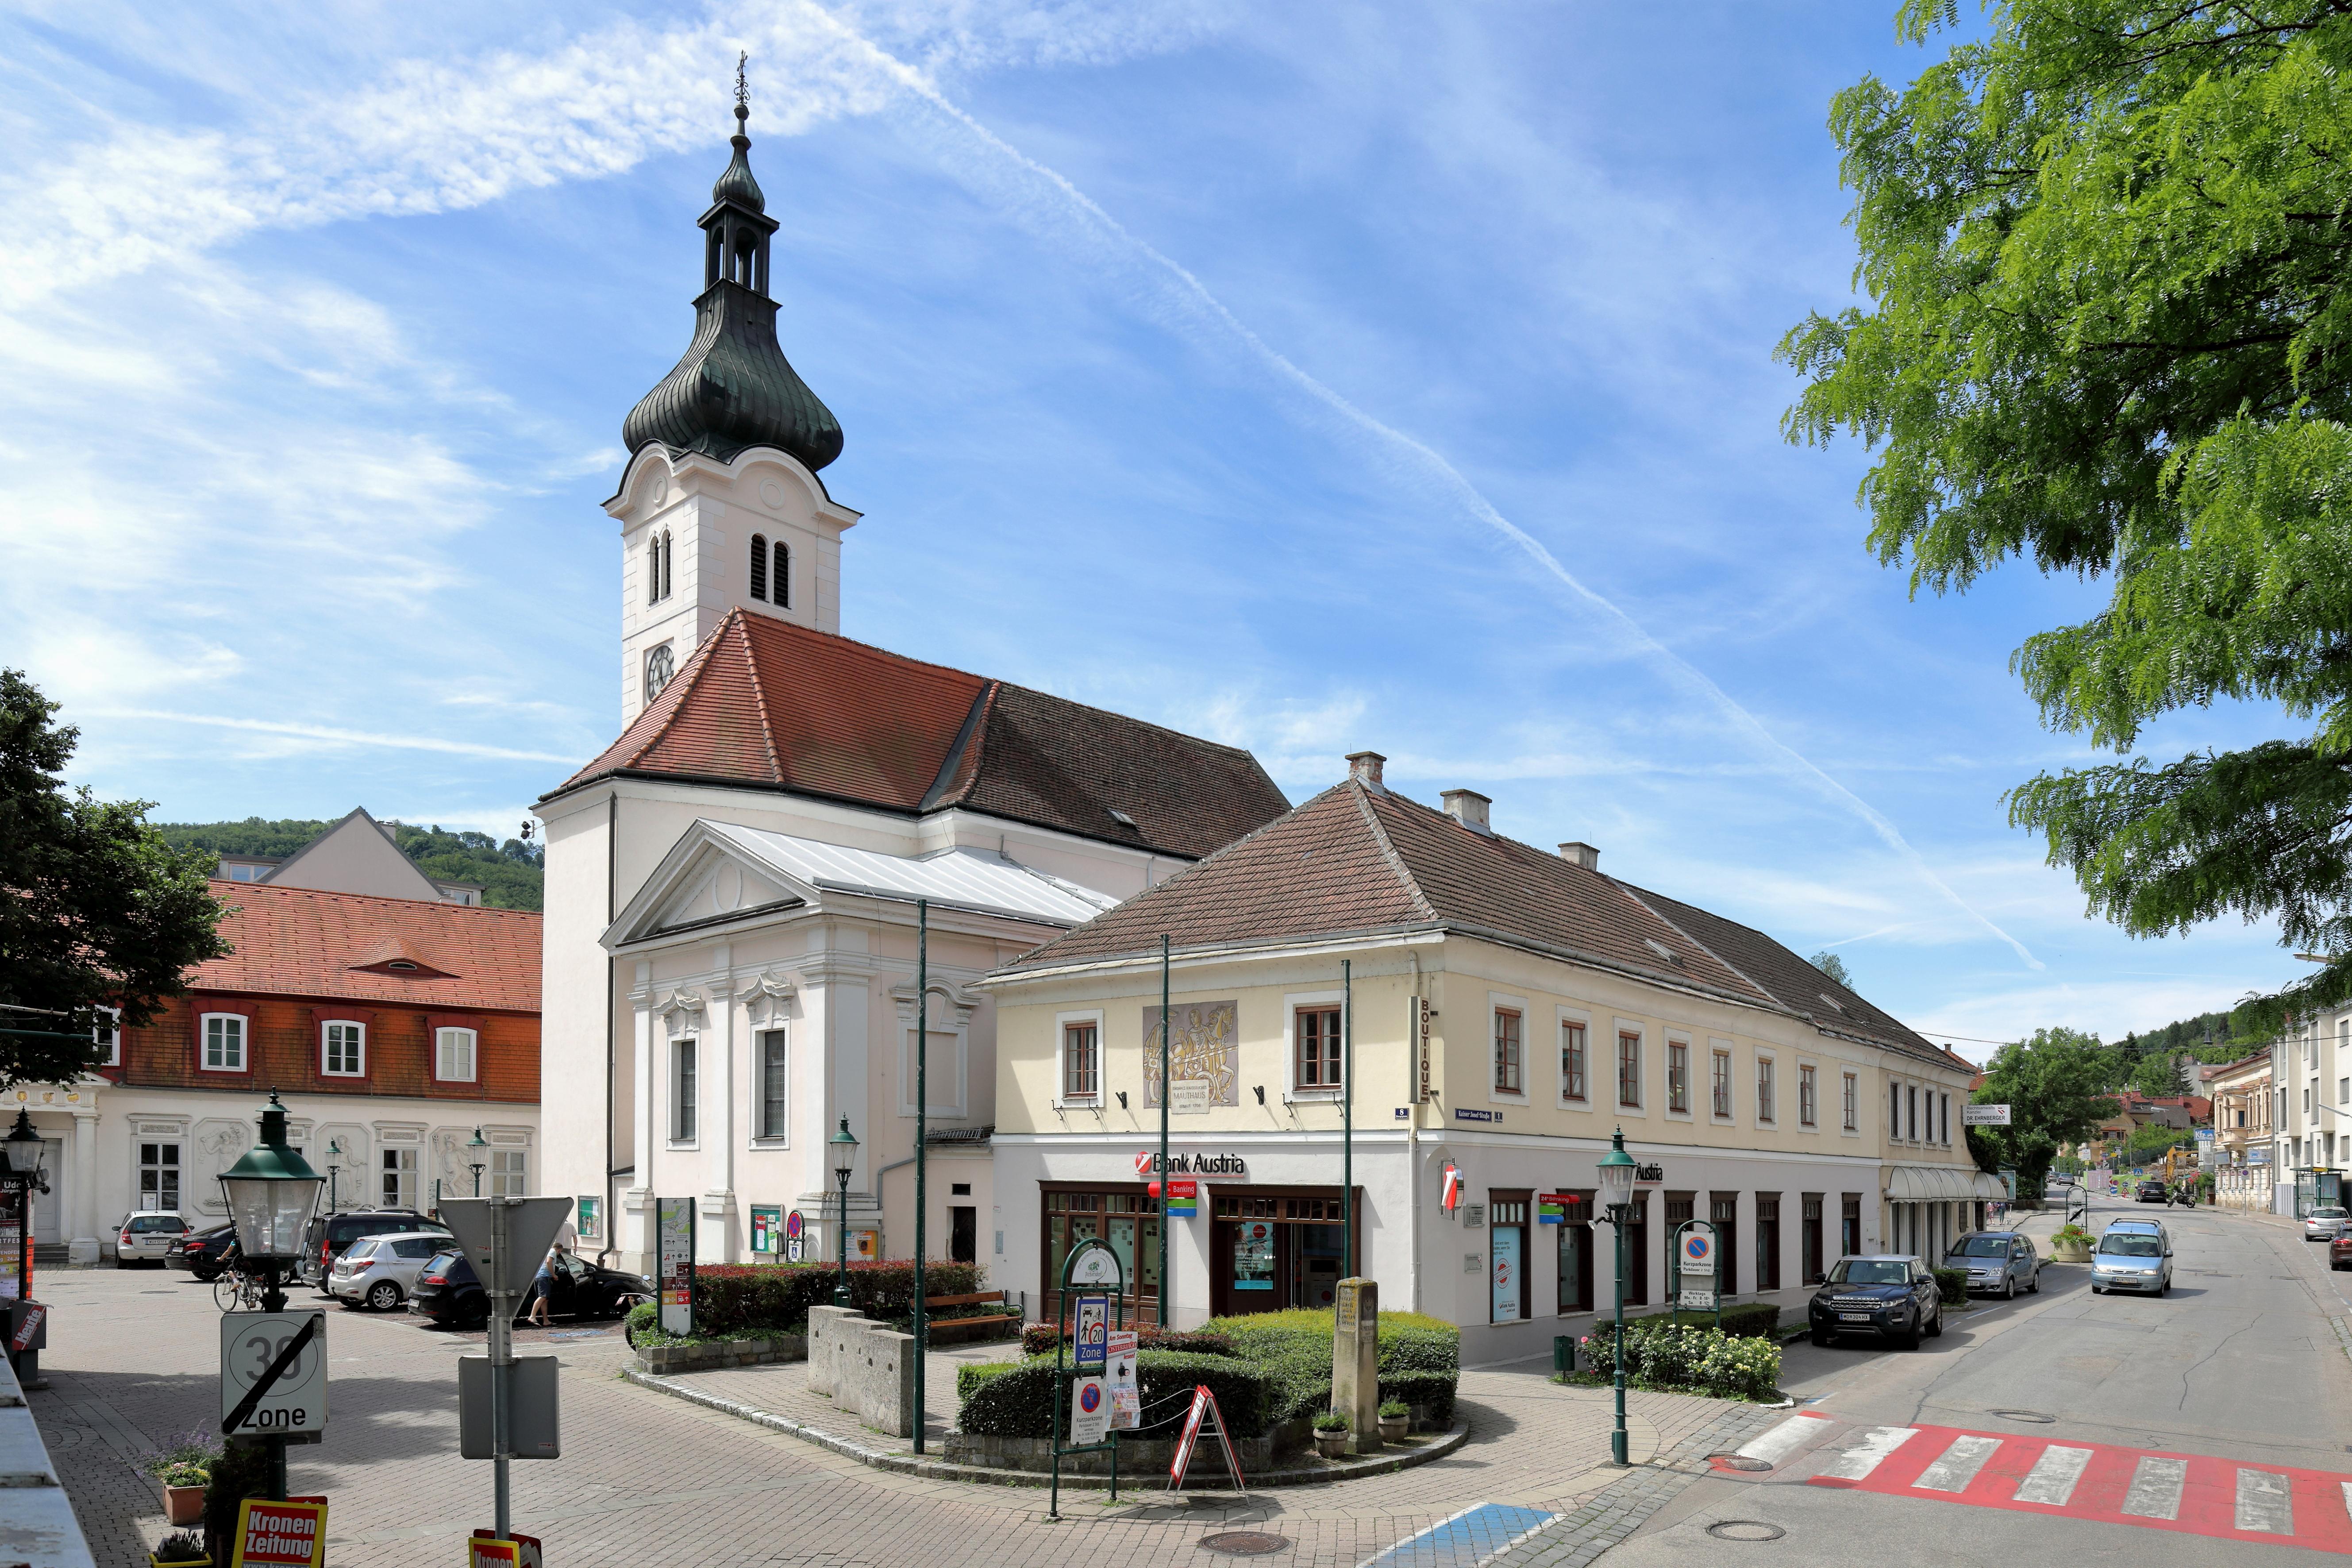 HAUS FEUCHTL PURKERSDORF (Austria) - from US 68